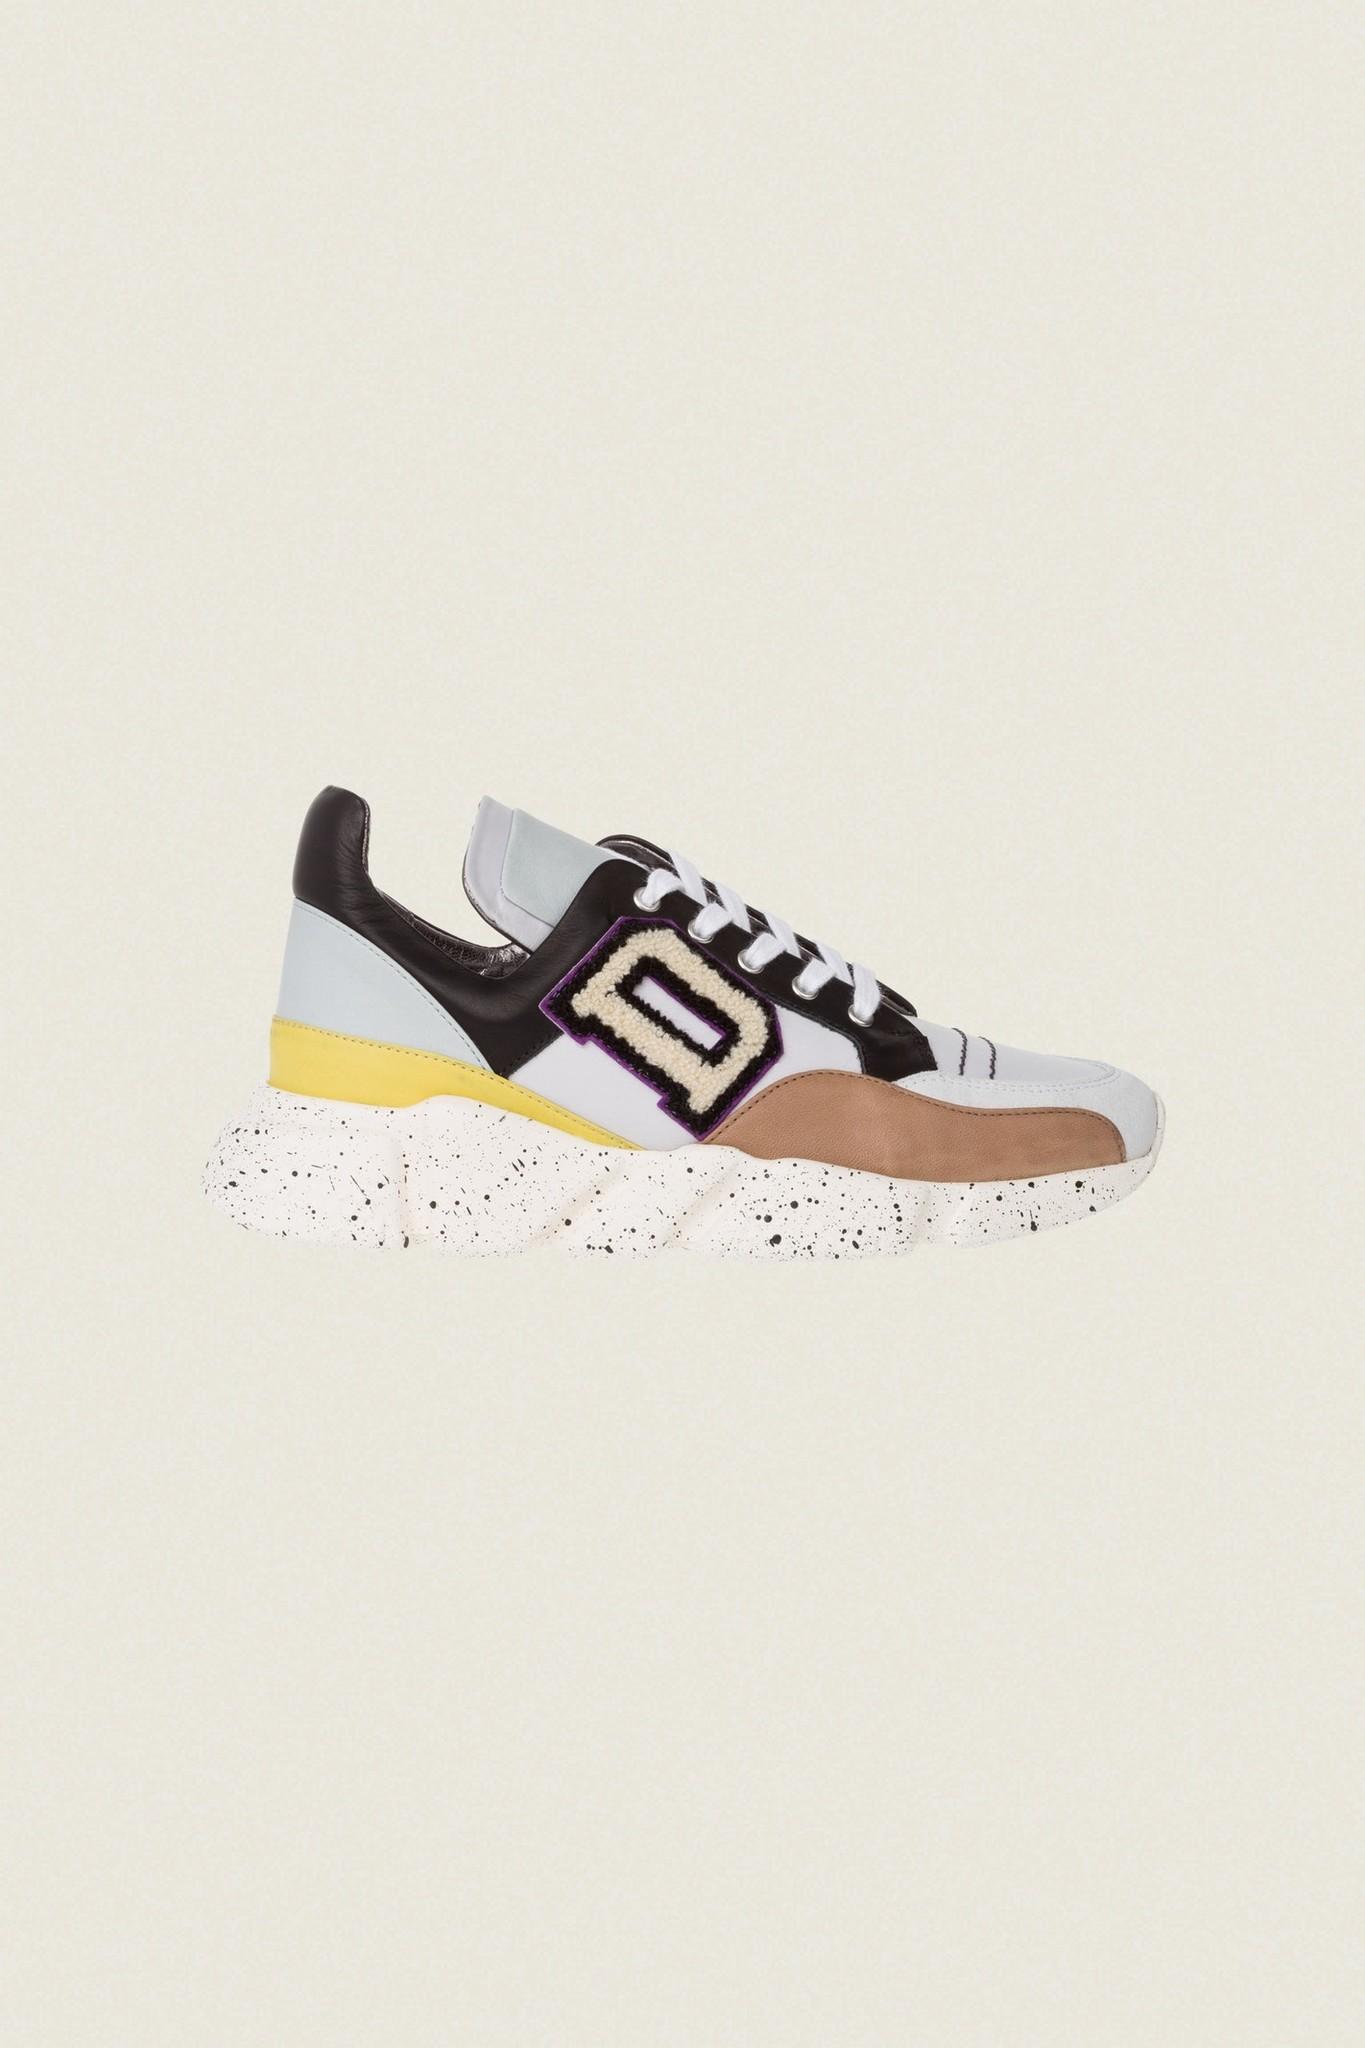 Patch Ambition D sneaker dorothee schumacher-5